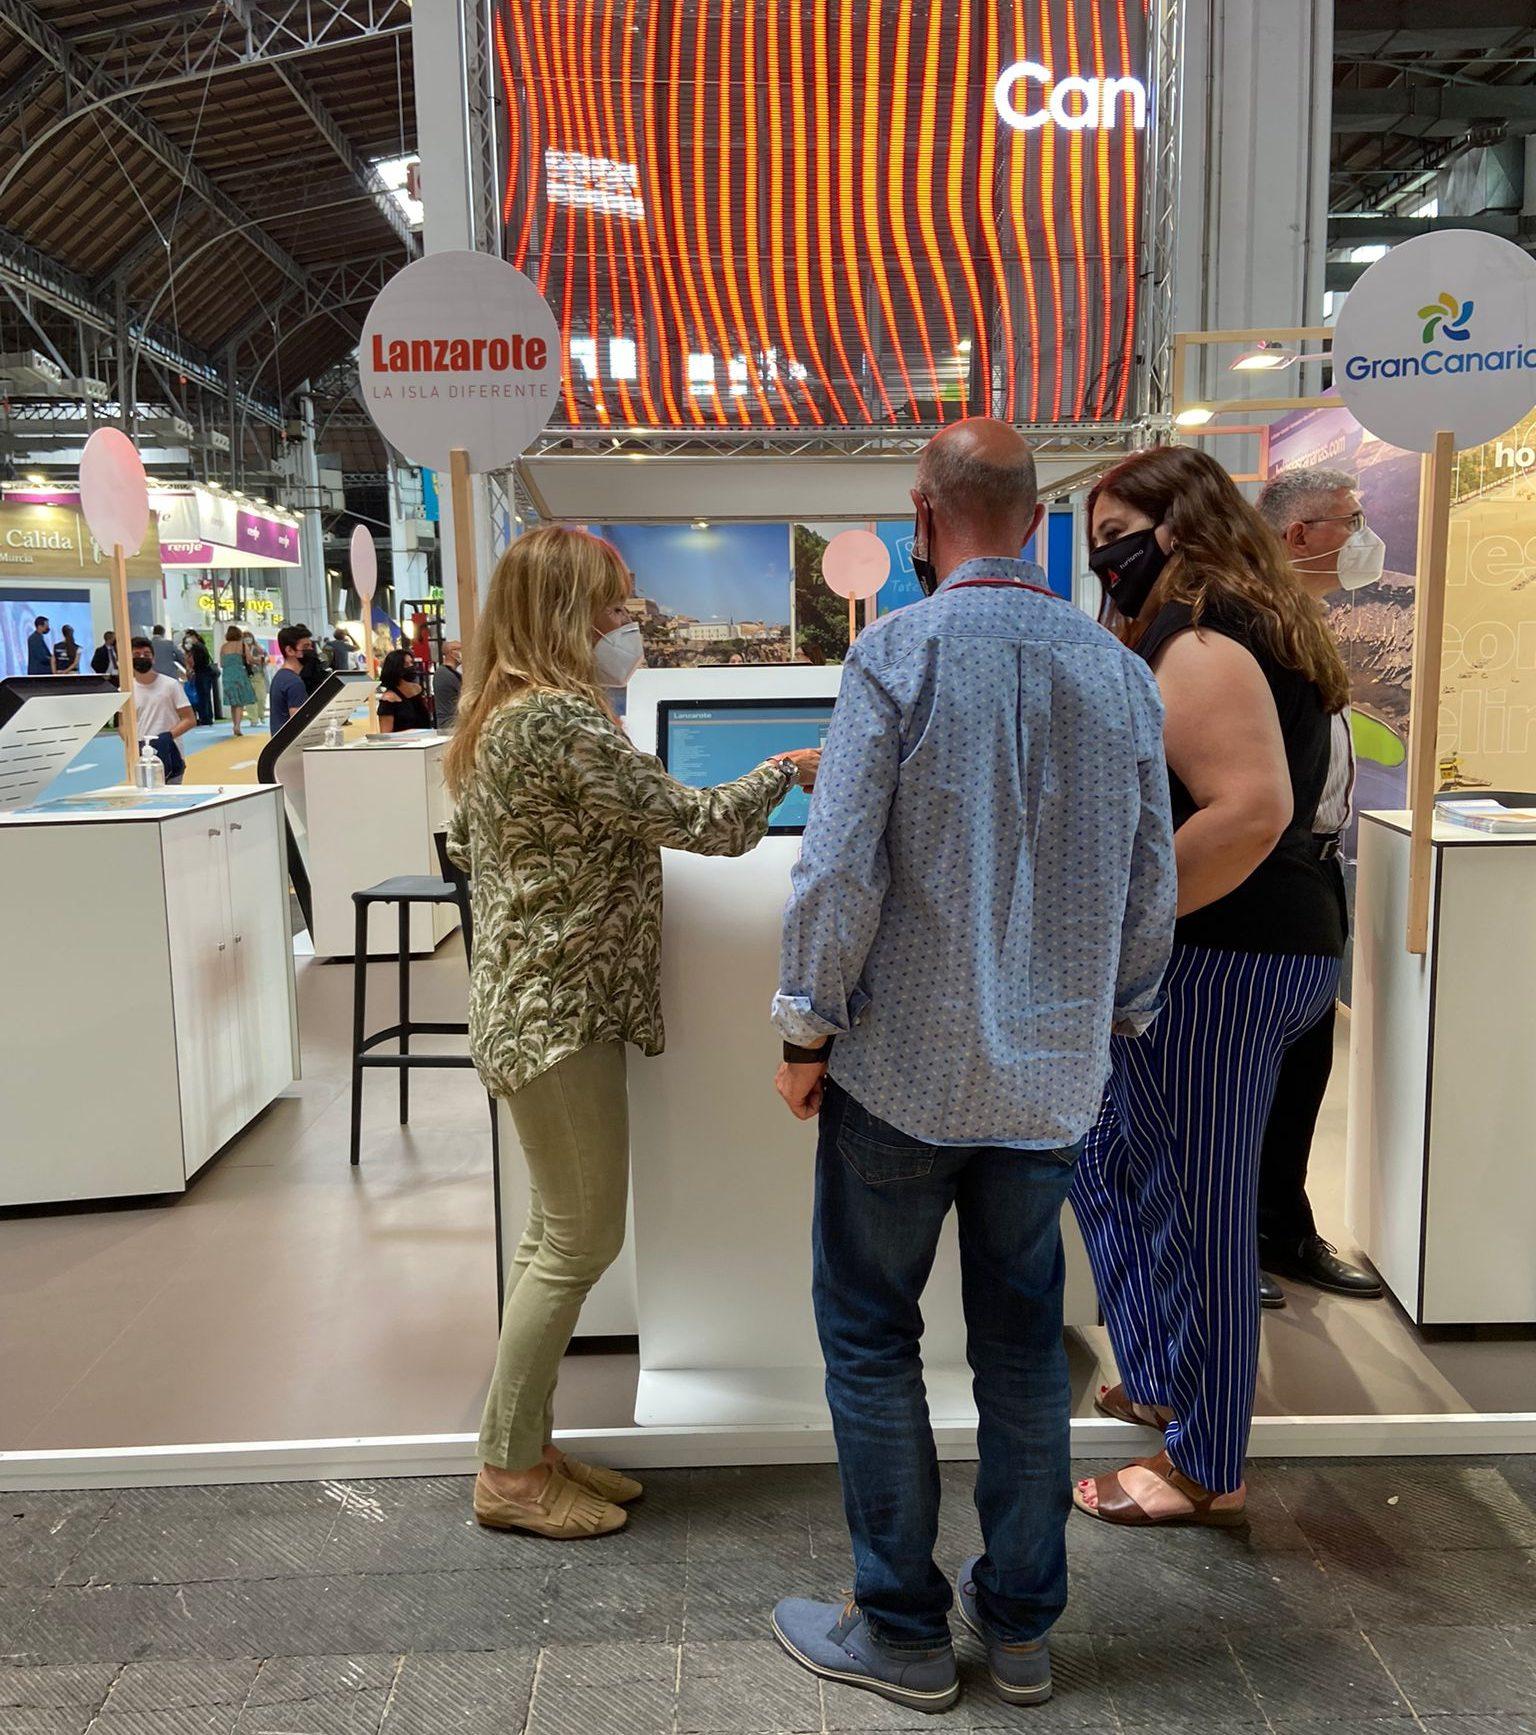 Turismo Lanzarote promociona la isla en B-Travel, la prestigiosa feria de experiencias viajeras de Barcelona